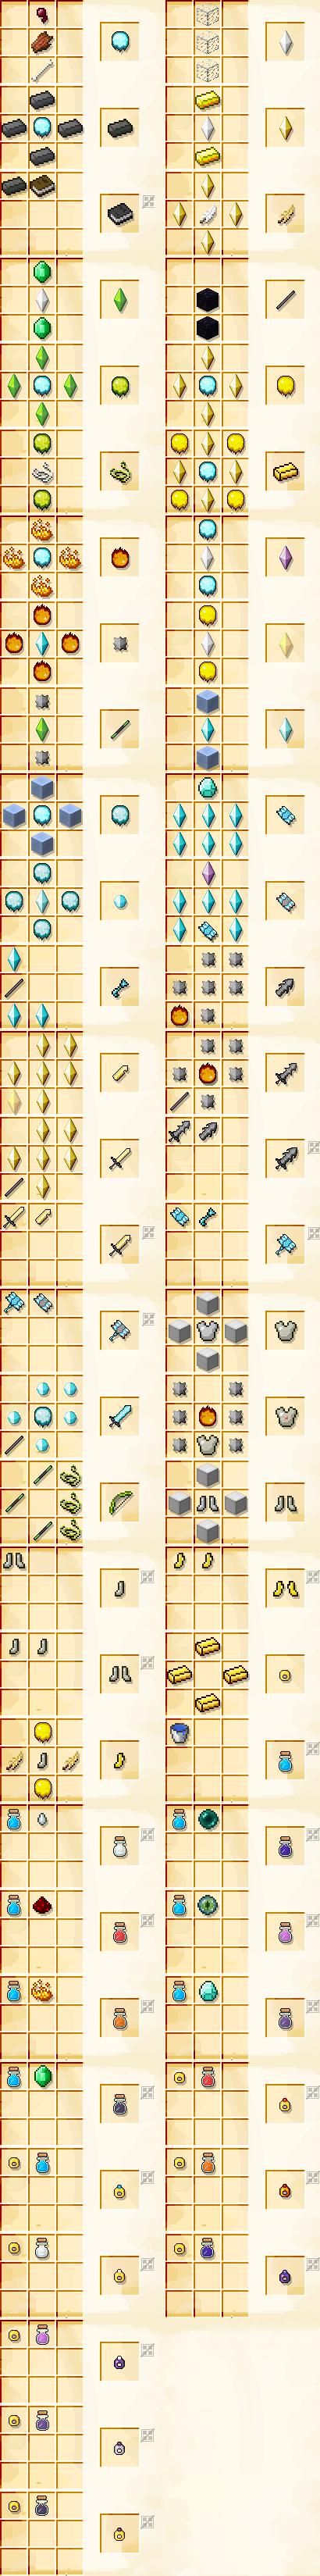 Gods-Weapons-Mod-7